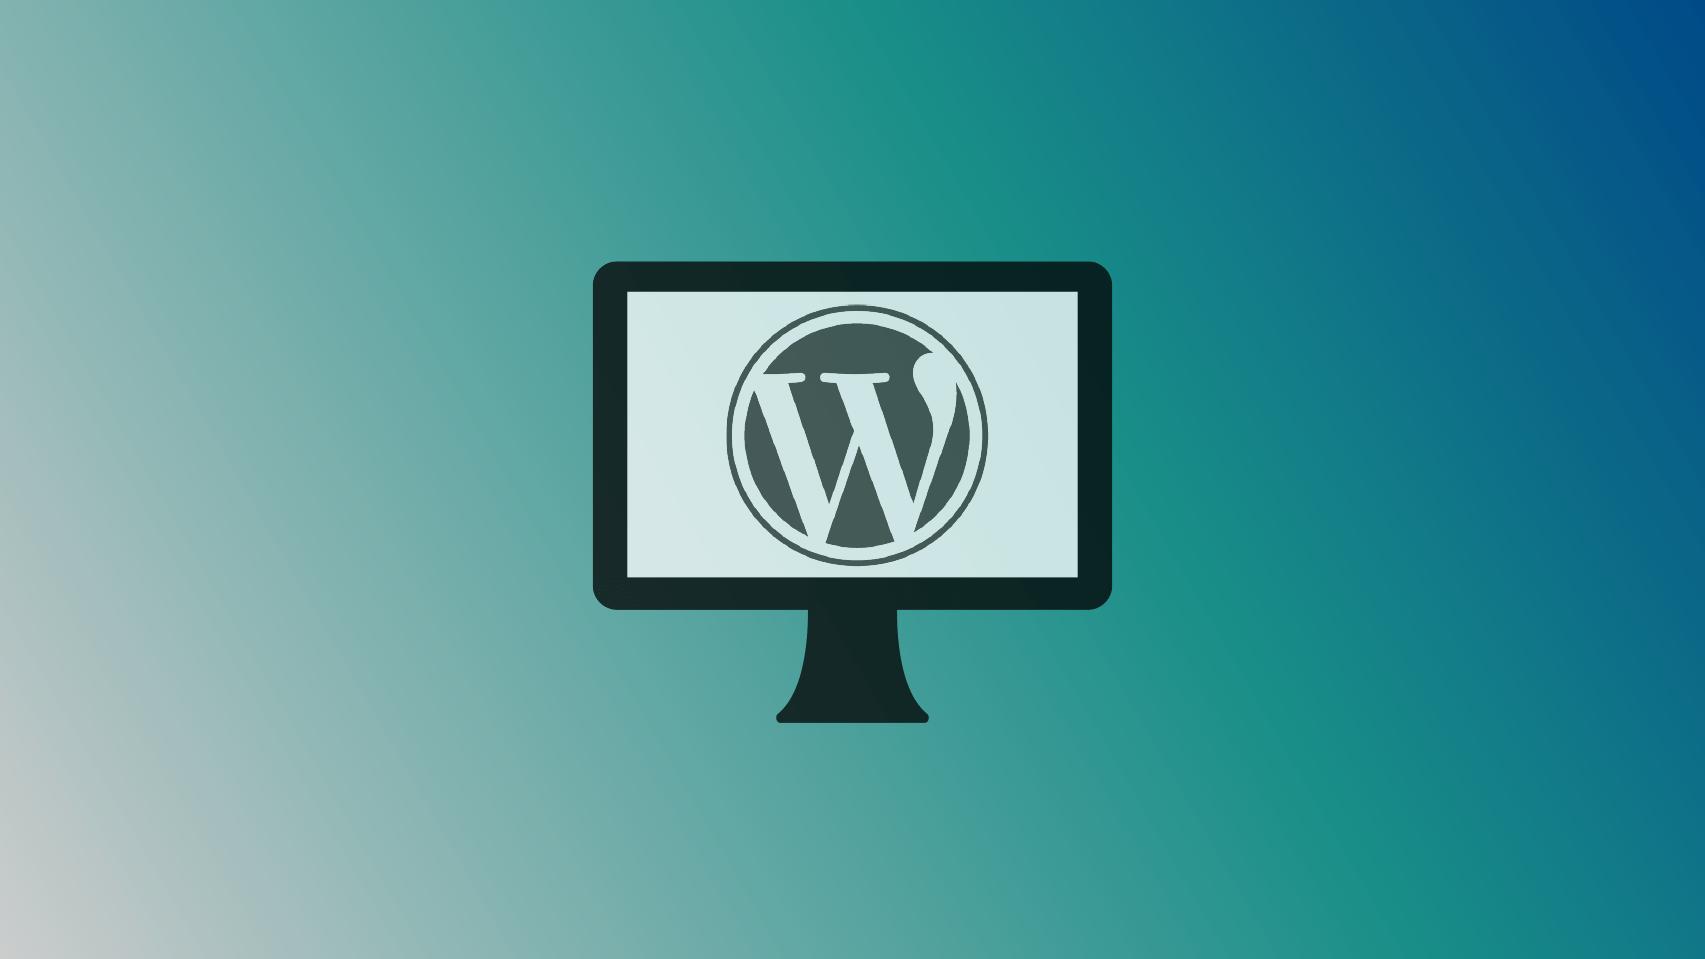 wordpress.org is our best friend.